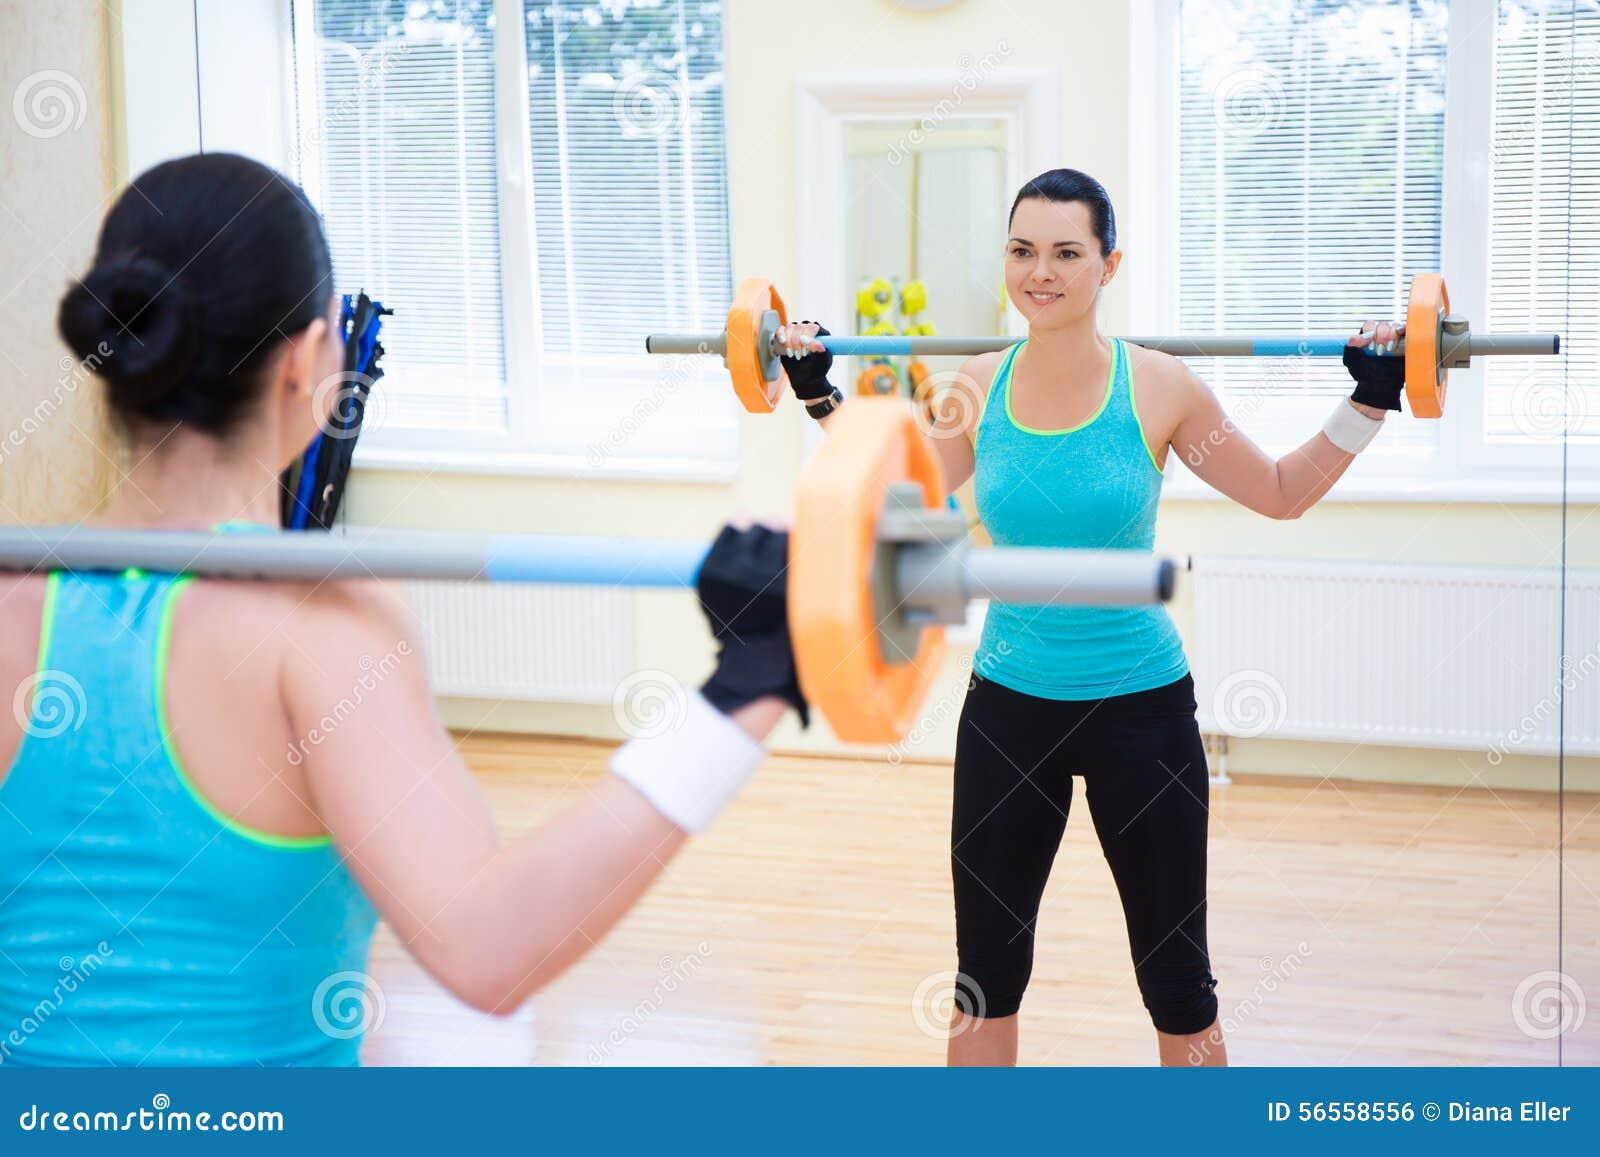 Download Έννοια Bodybuilding - νέα γυναίκα που ασκεί με το Barbell Στοκ Εικόνες - εικόνα από πρόσωπο, καθρέφτης: 56558556